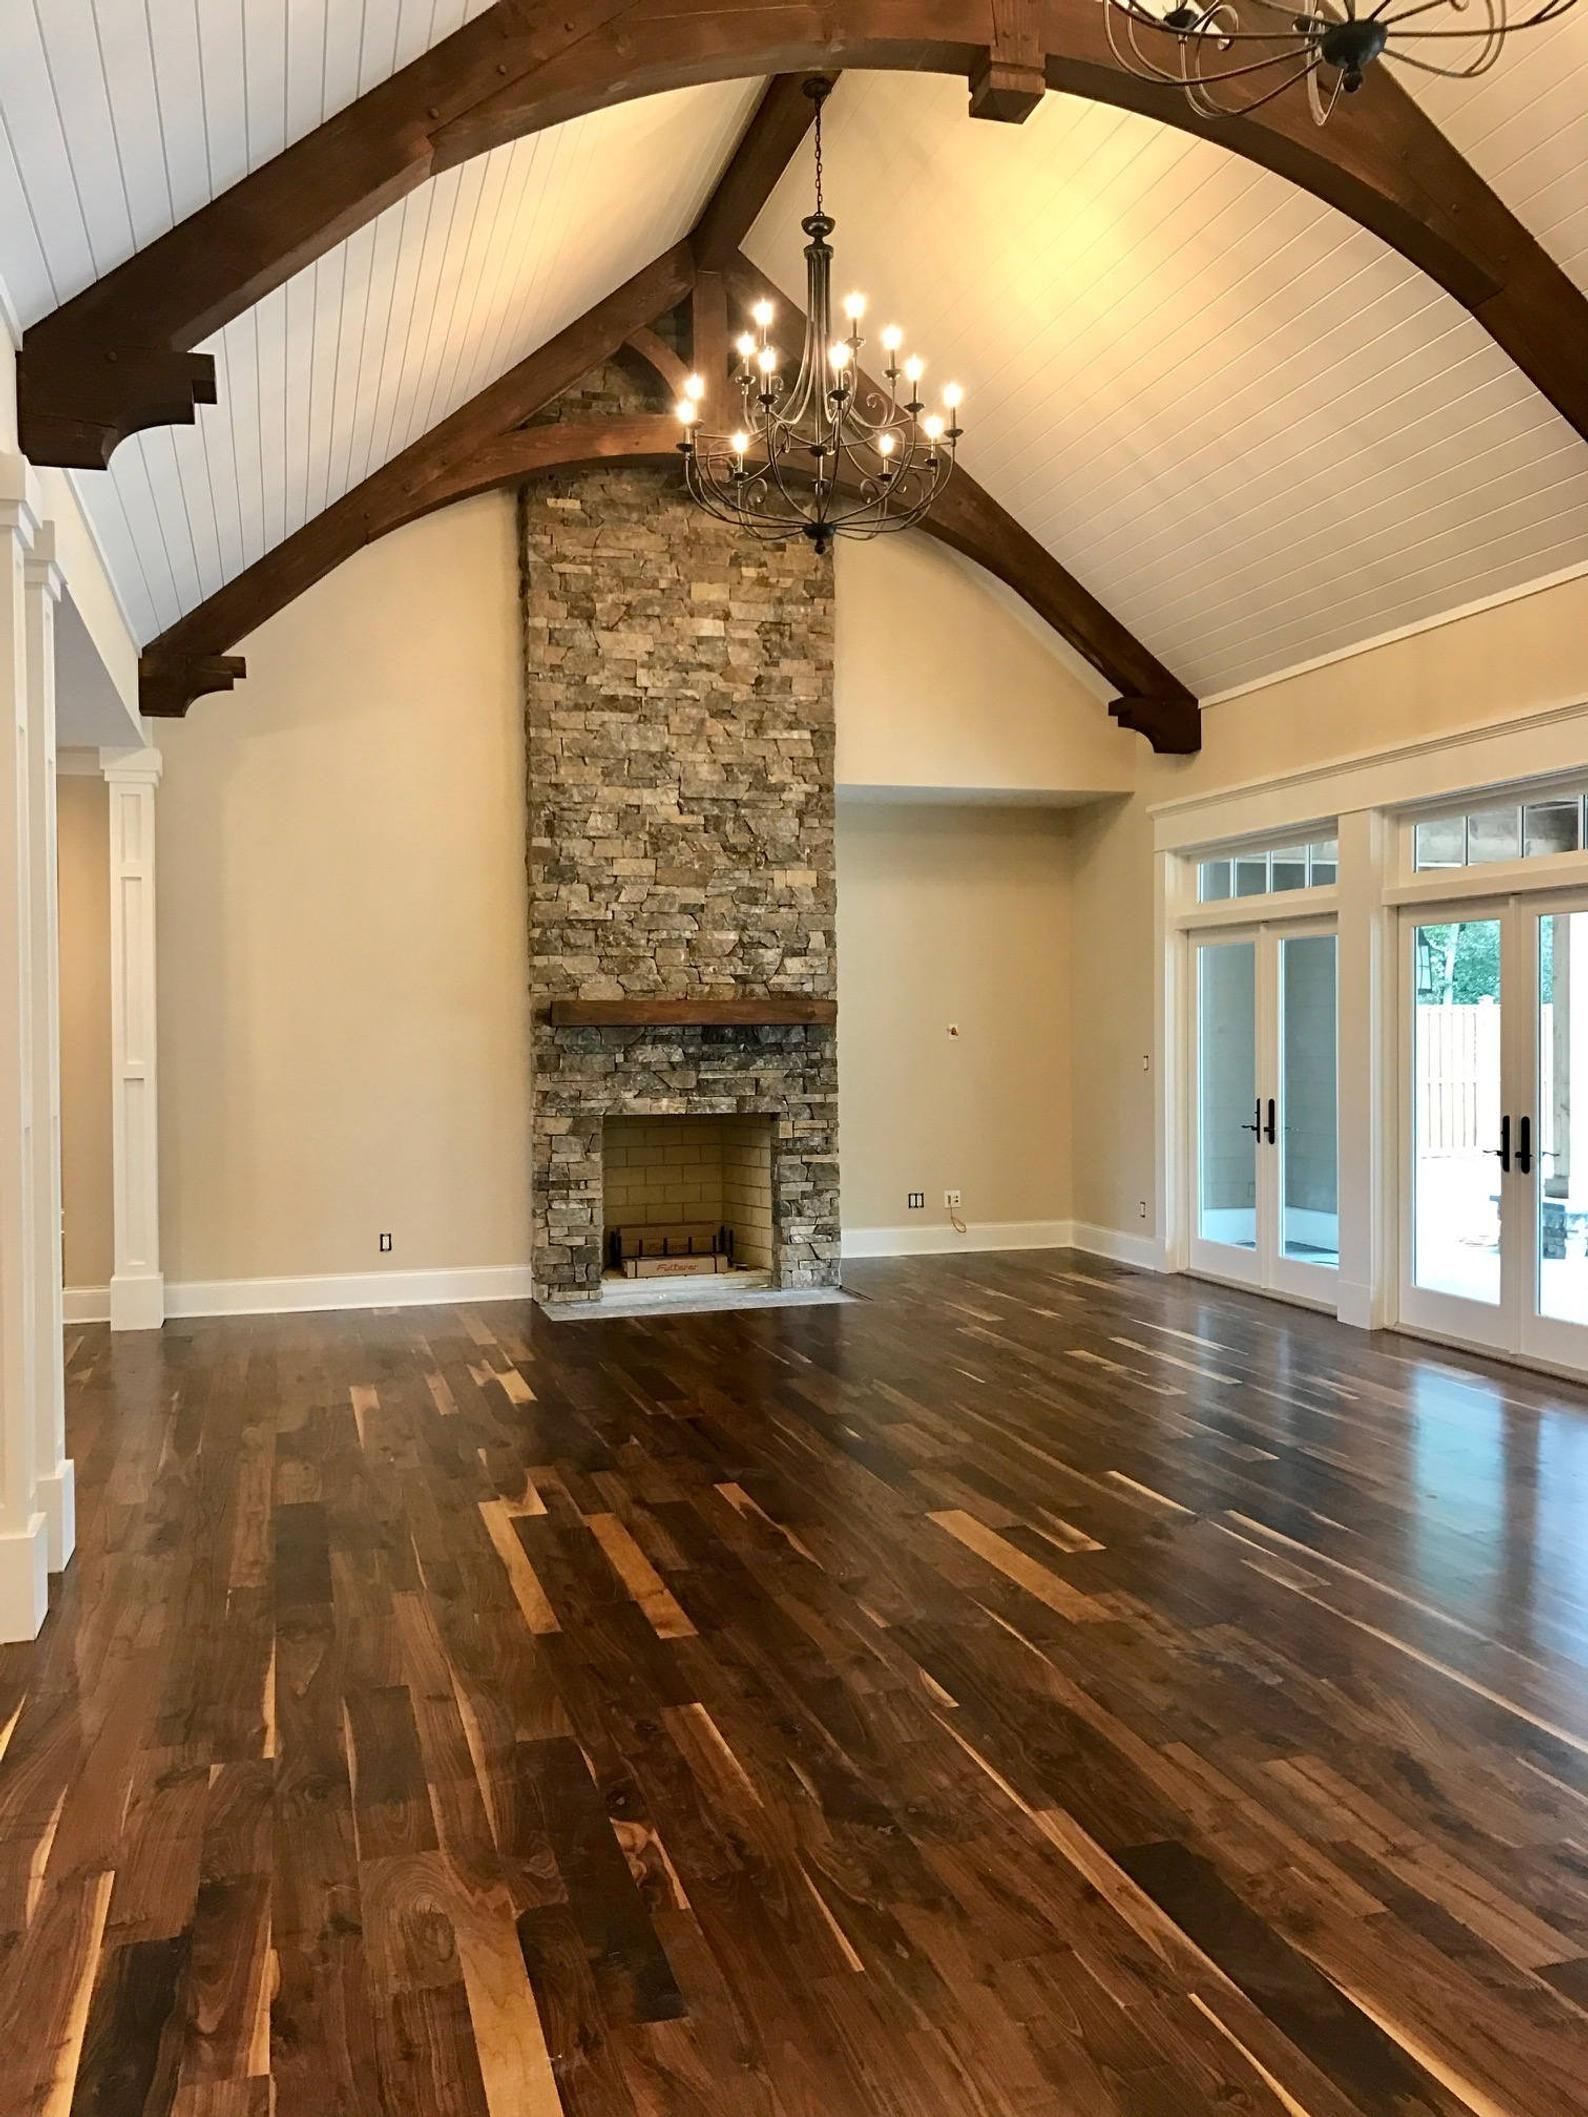 Old Growth Black Walnut Hardwood Flooring (With images